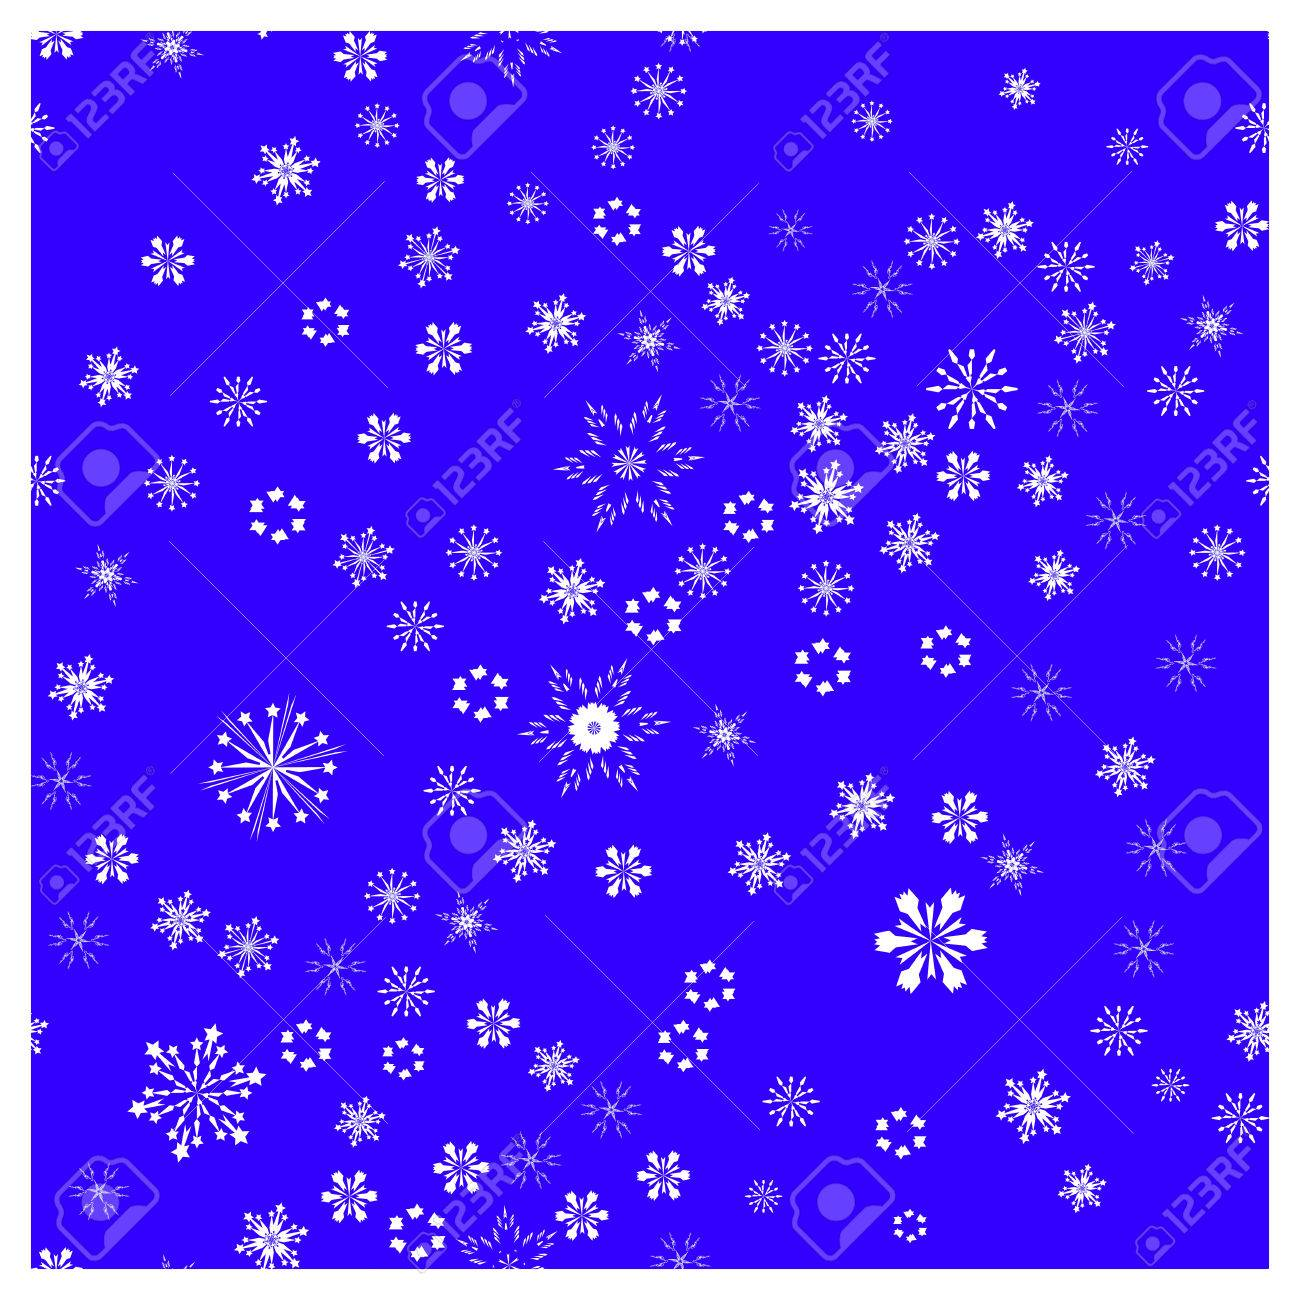 Christmas Gift Wrapper Design.Christmas Gift Wrapper Design